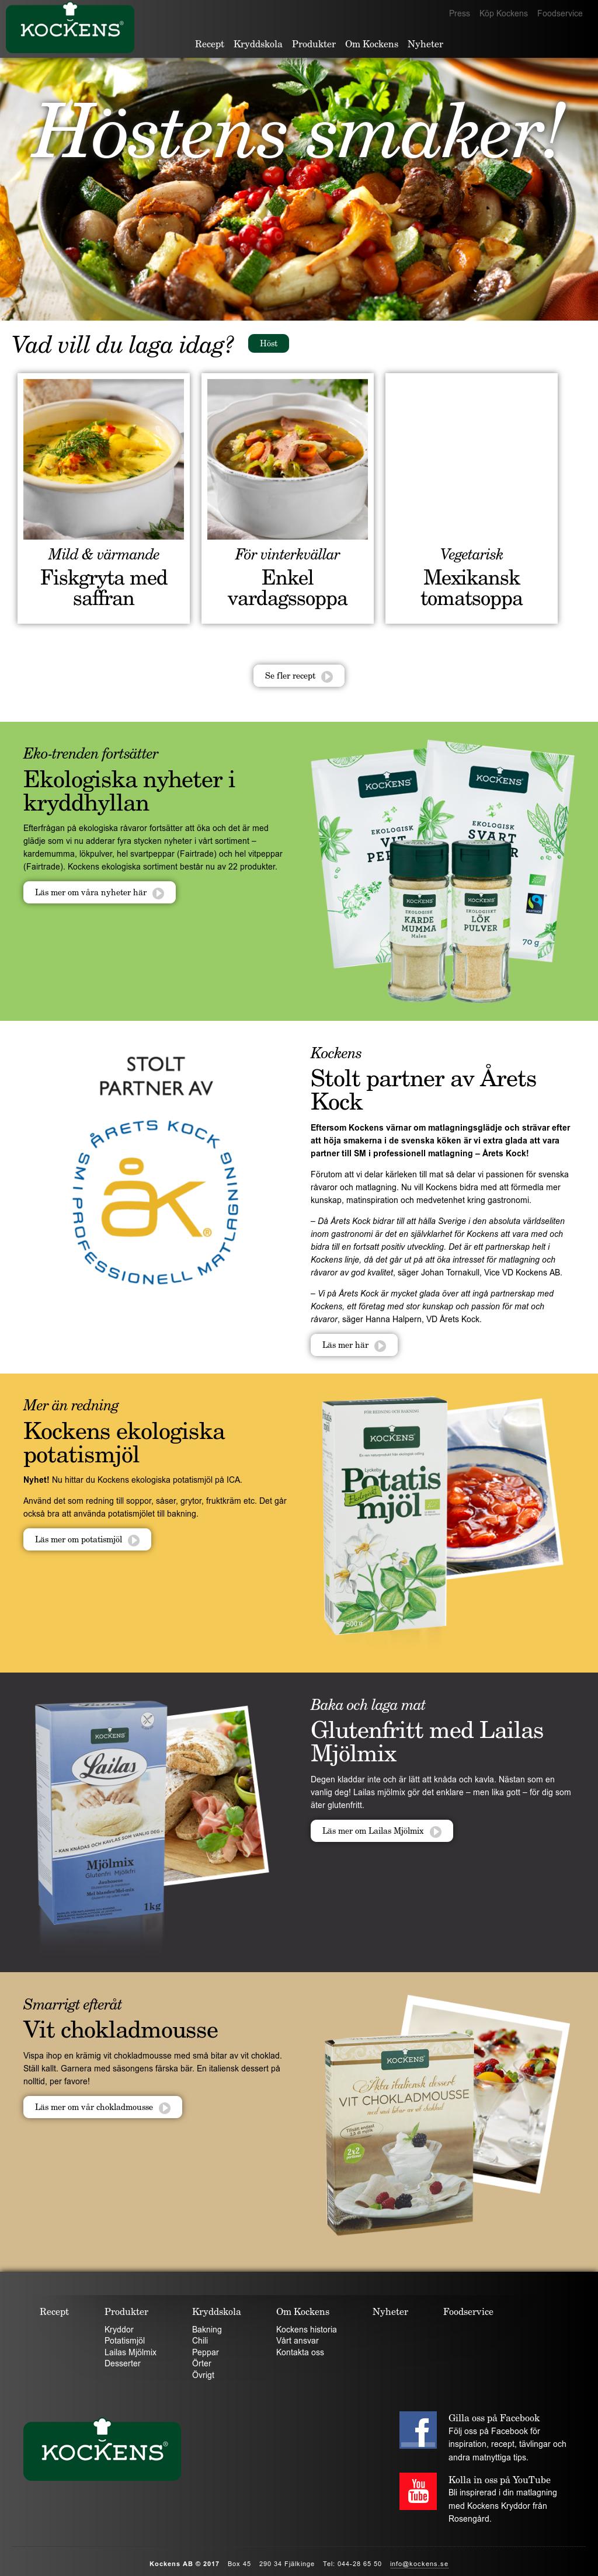 Kockens kryddor online dating